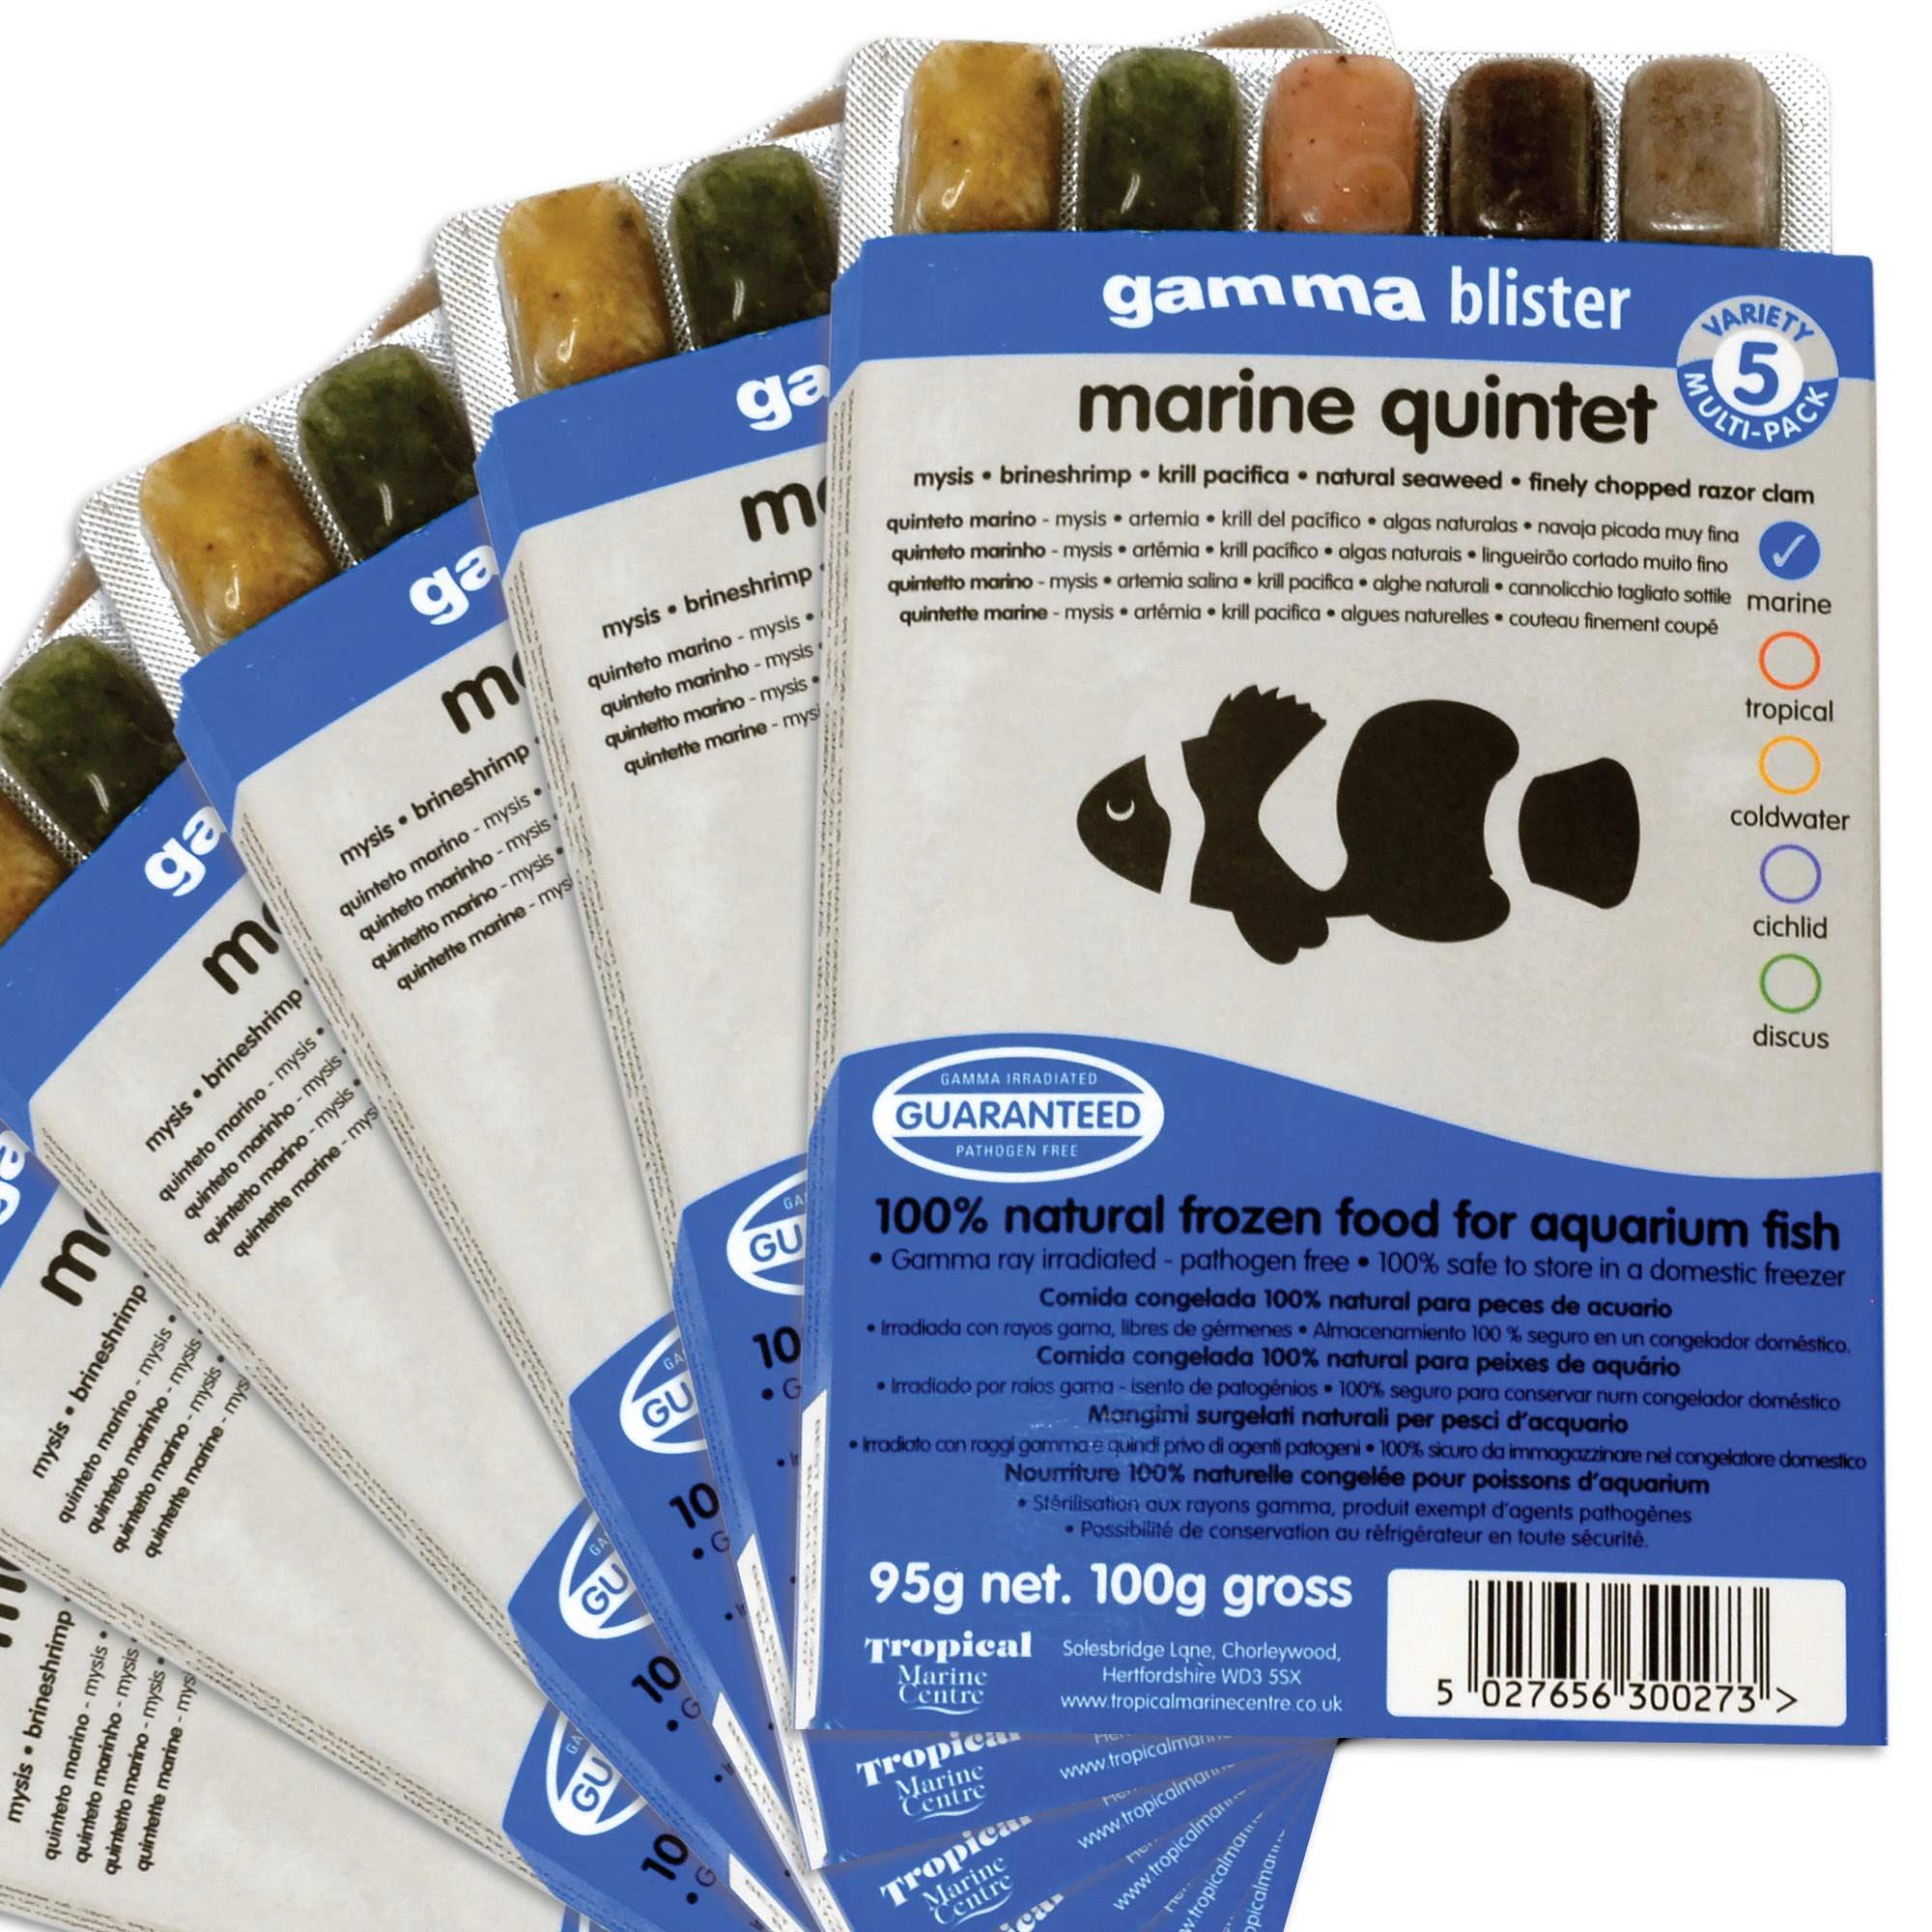 Gamma Frozen Food Marine Quintet Blister Pack Fish Food ...